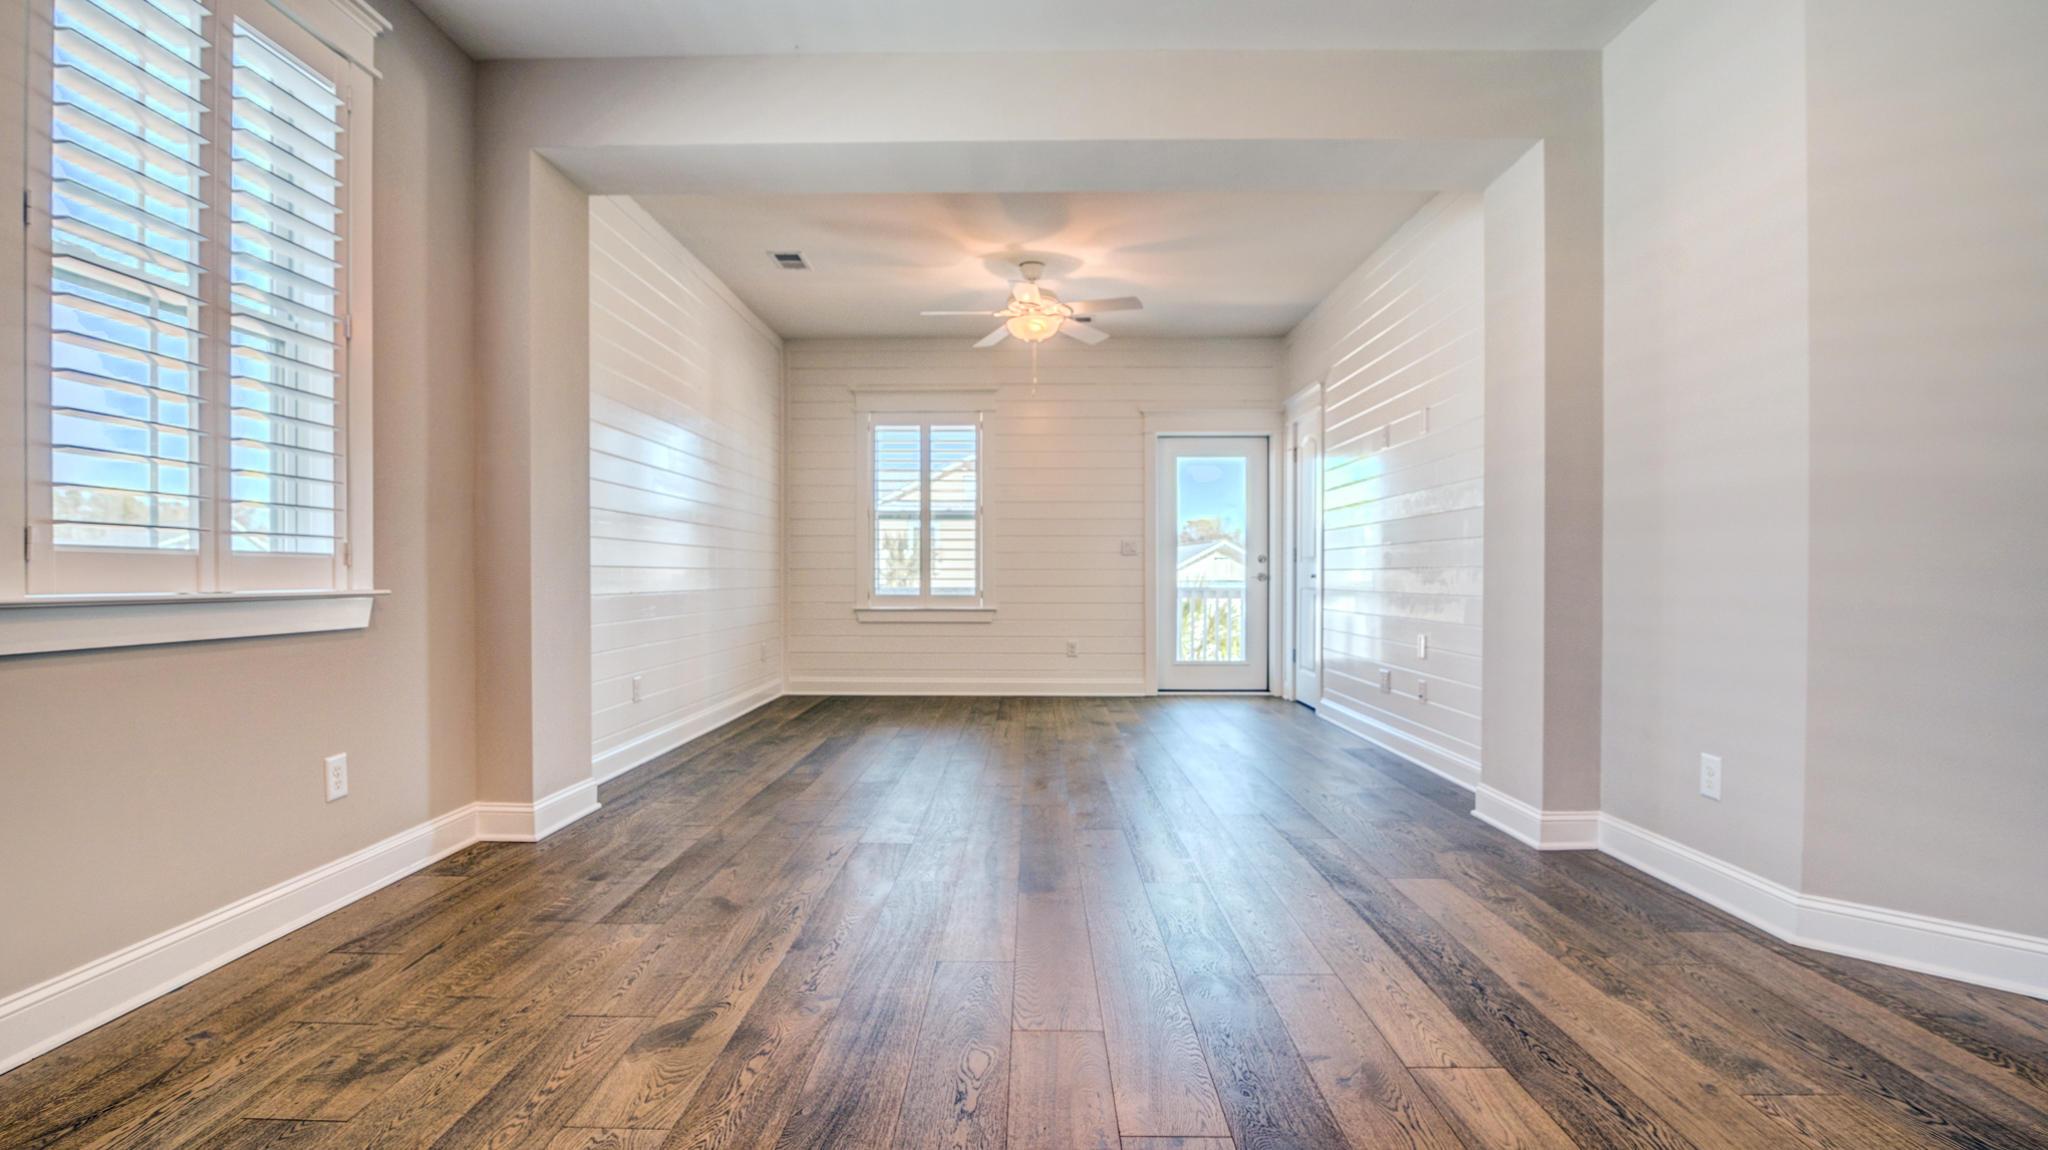 Carolina Park Homes For Sale - 3687 Spindrift, Mount Pleasant, SC - 31